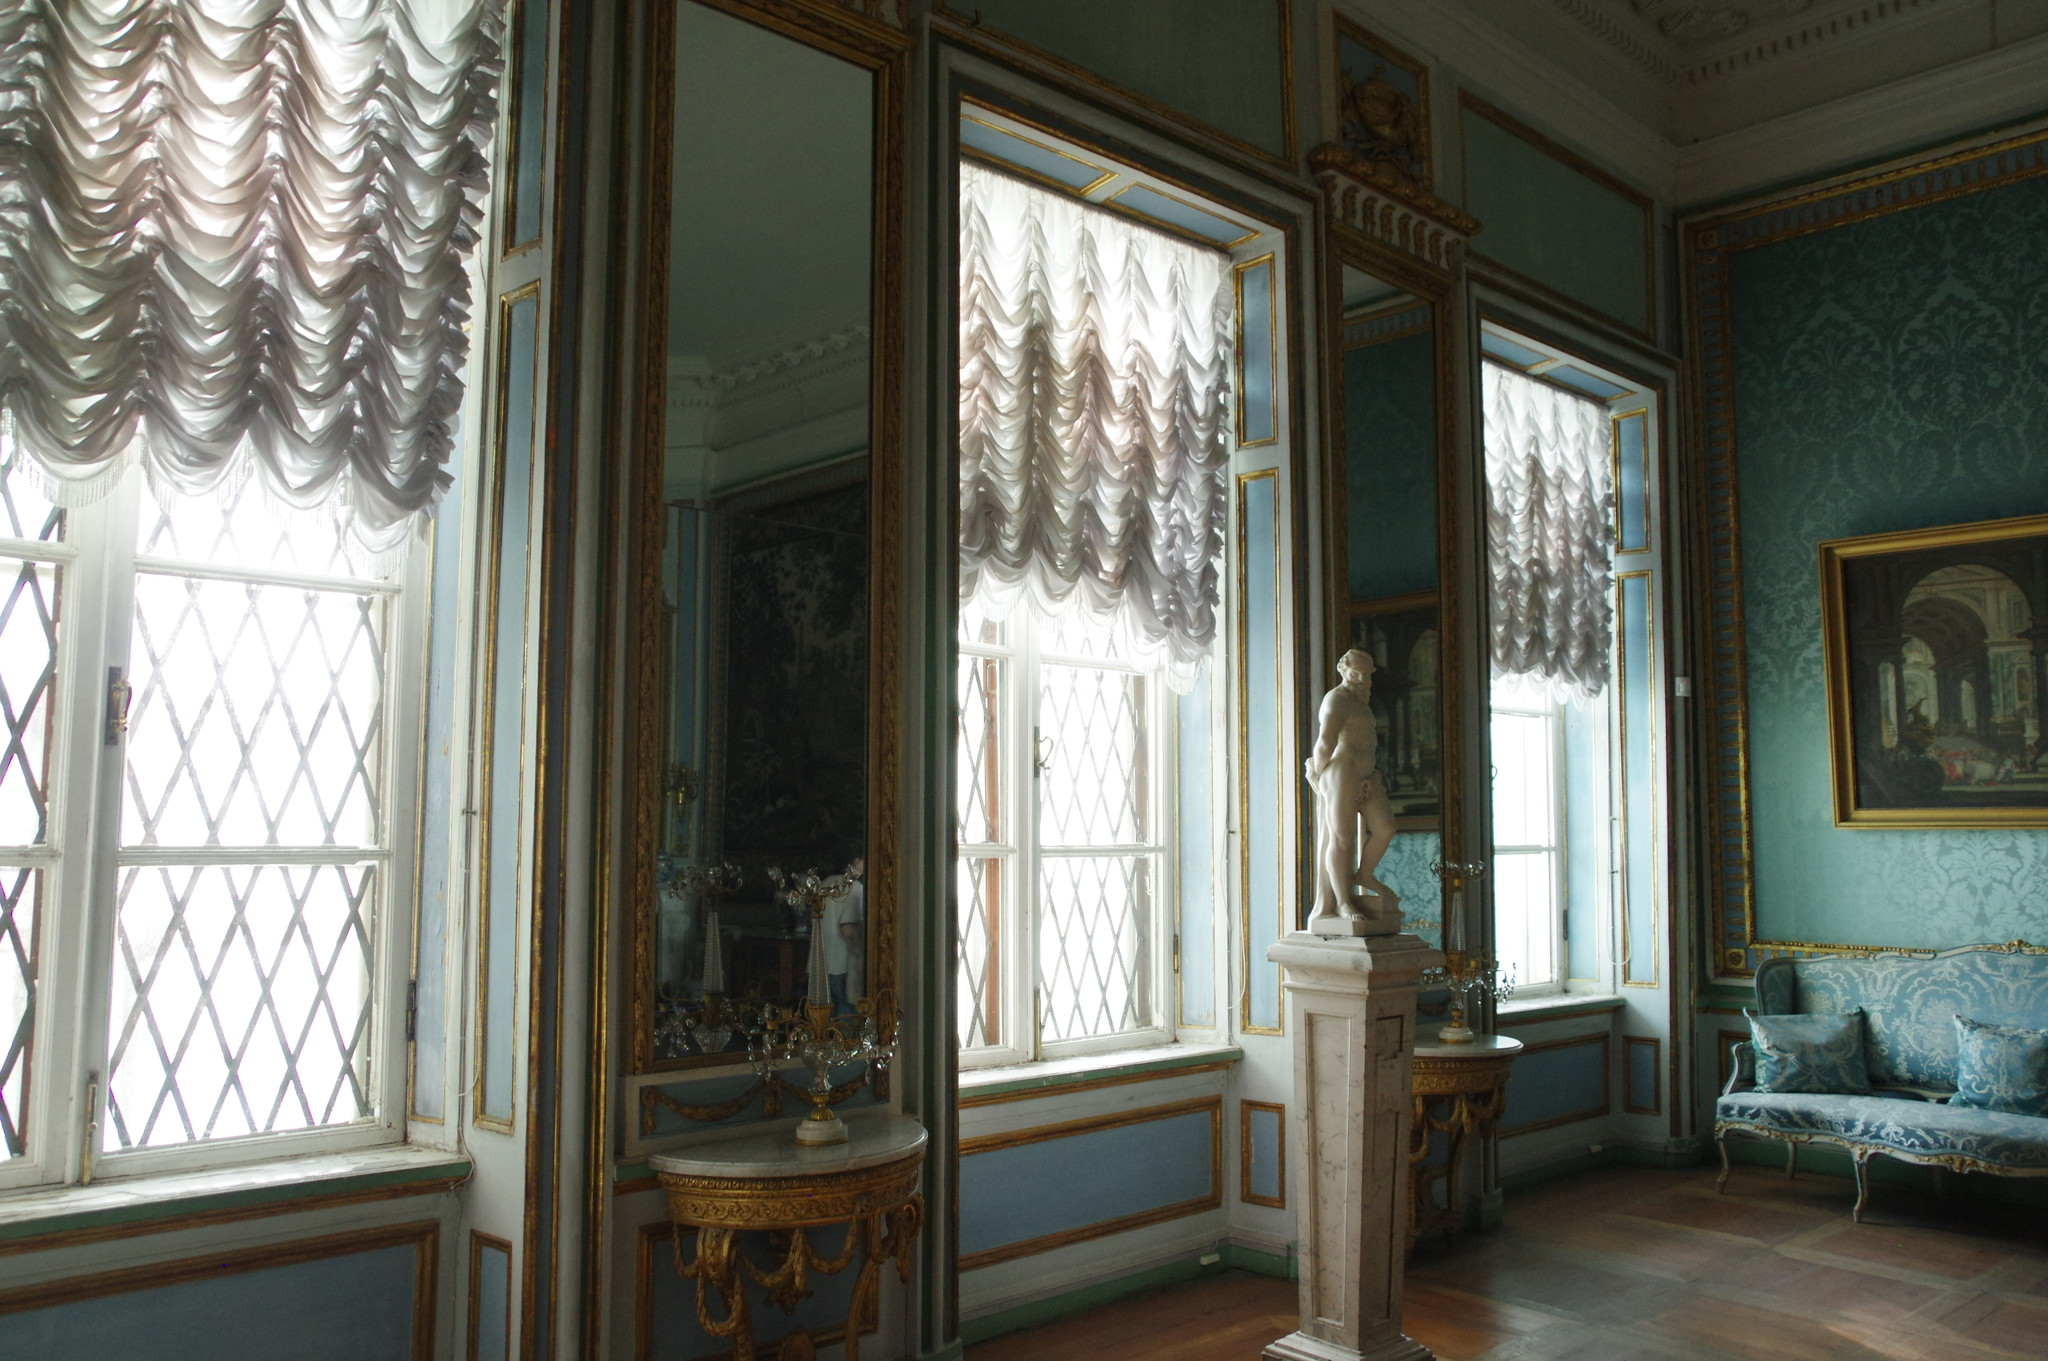 Дворец - композиционный центр ансамбля «Кусково»